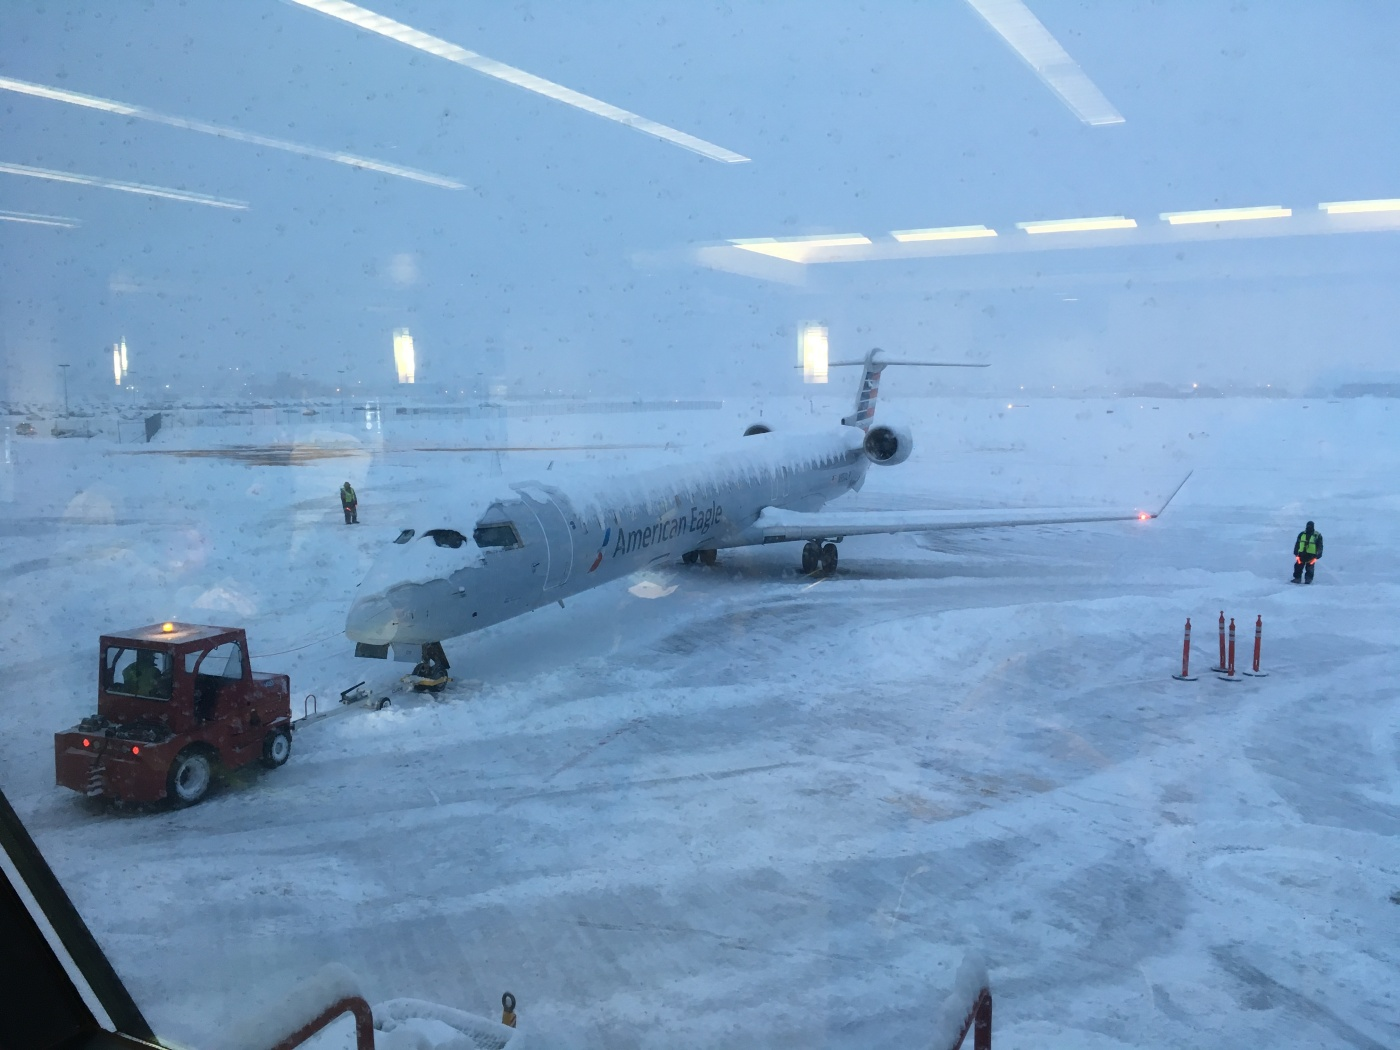 AA plane at gate FSD